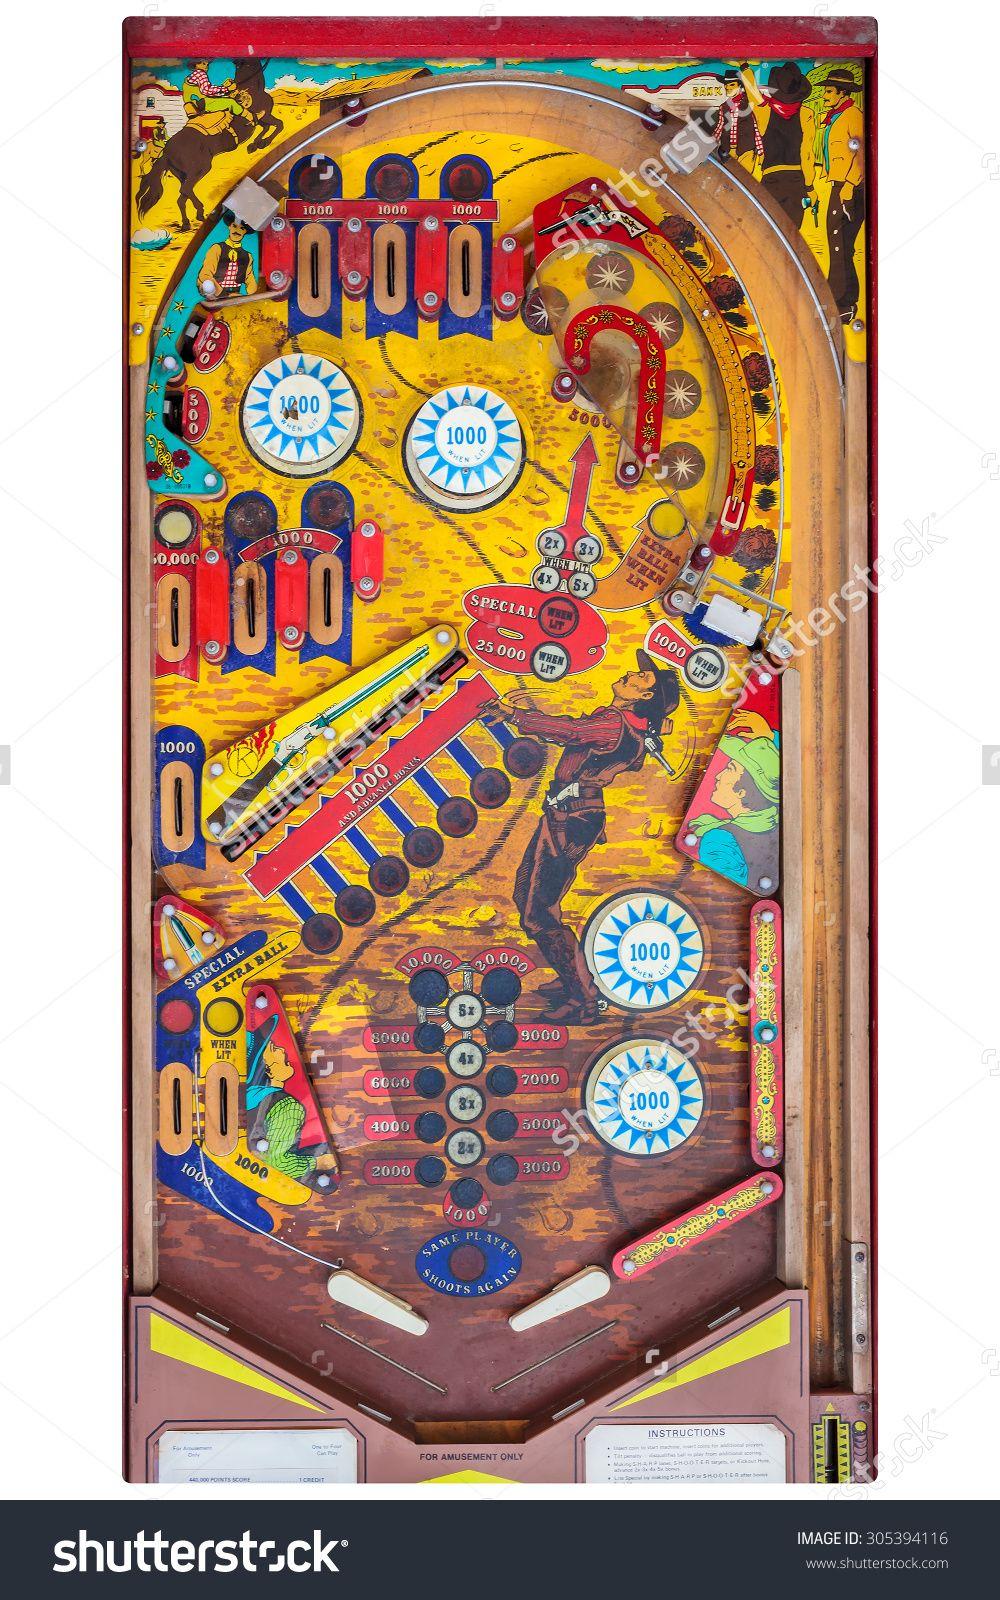 Zaccaria Pinball - Strike SS - Top View Gameplay - YouTube |Pinball Top View